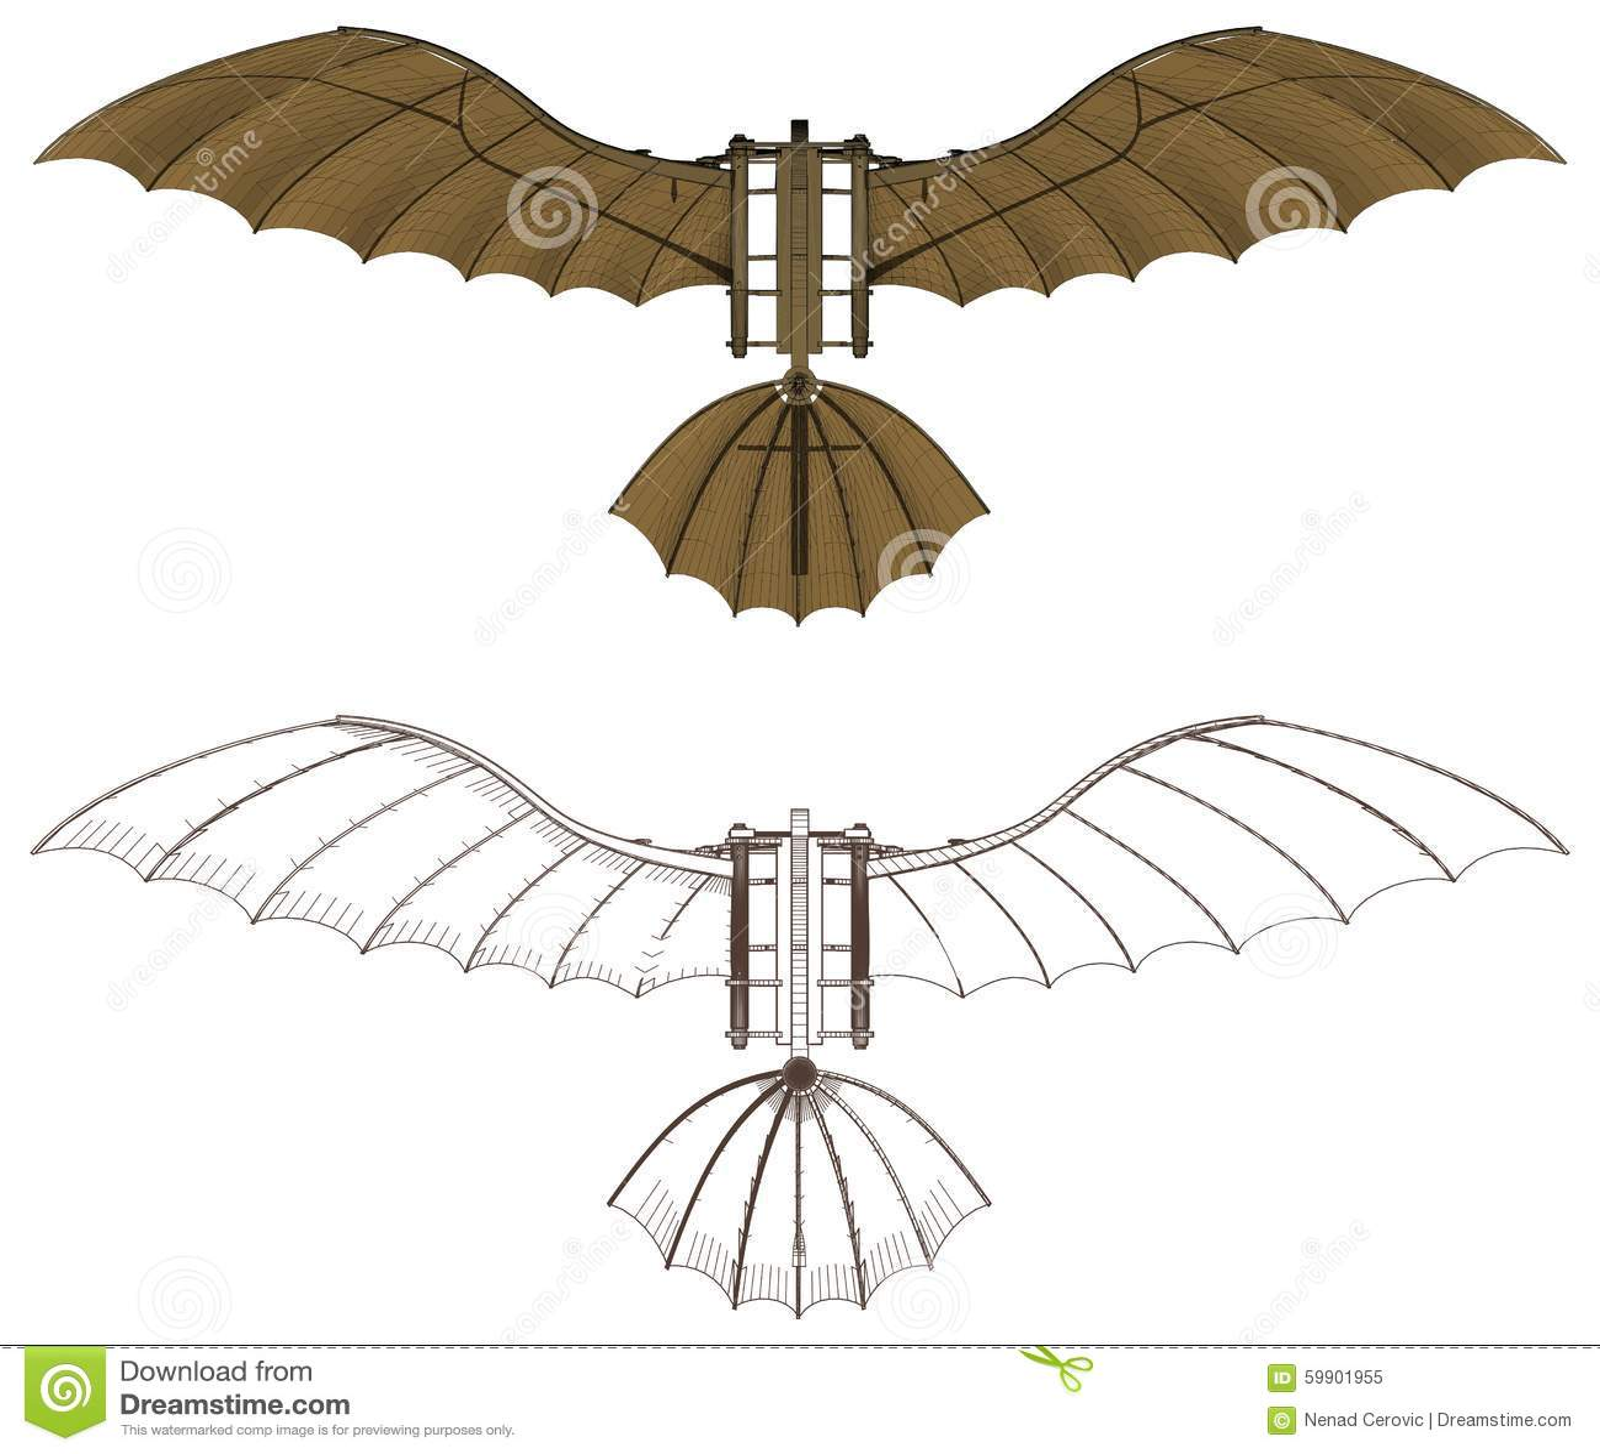 da vinci s flying machine